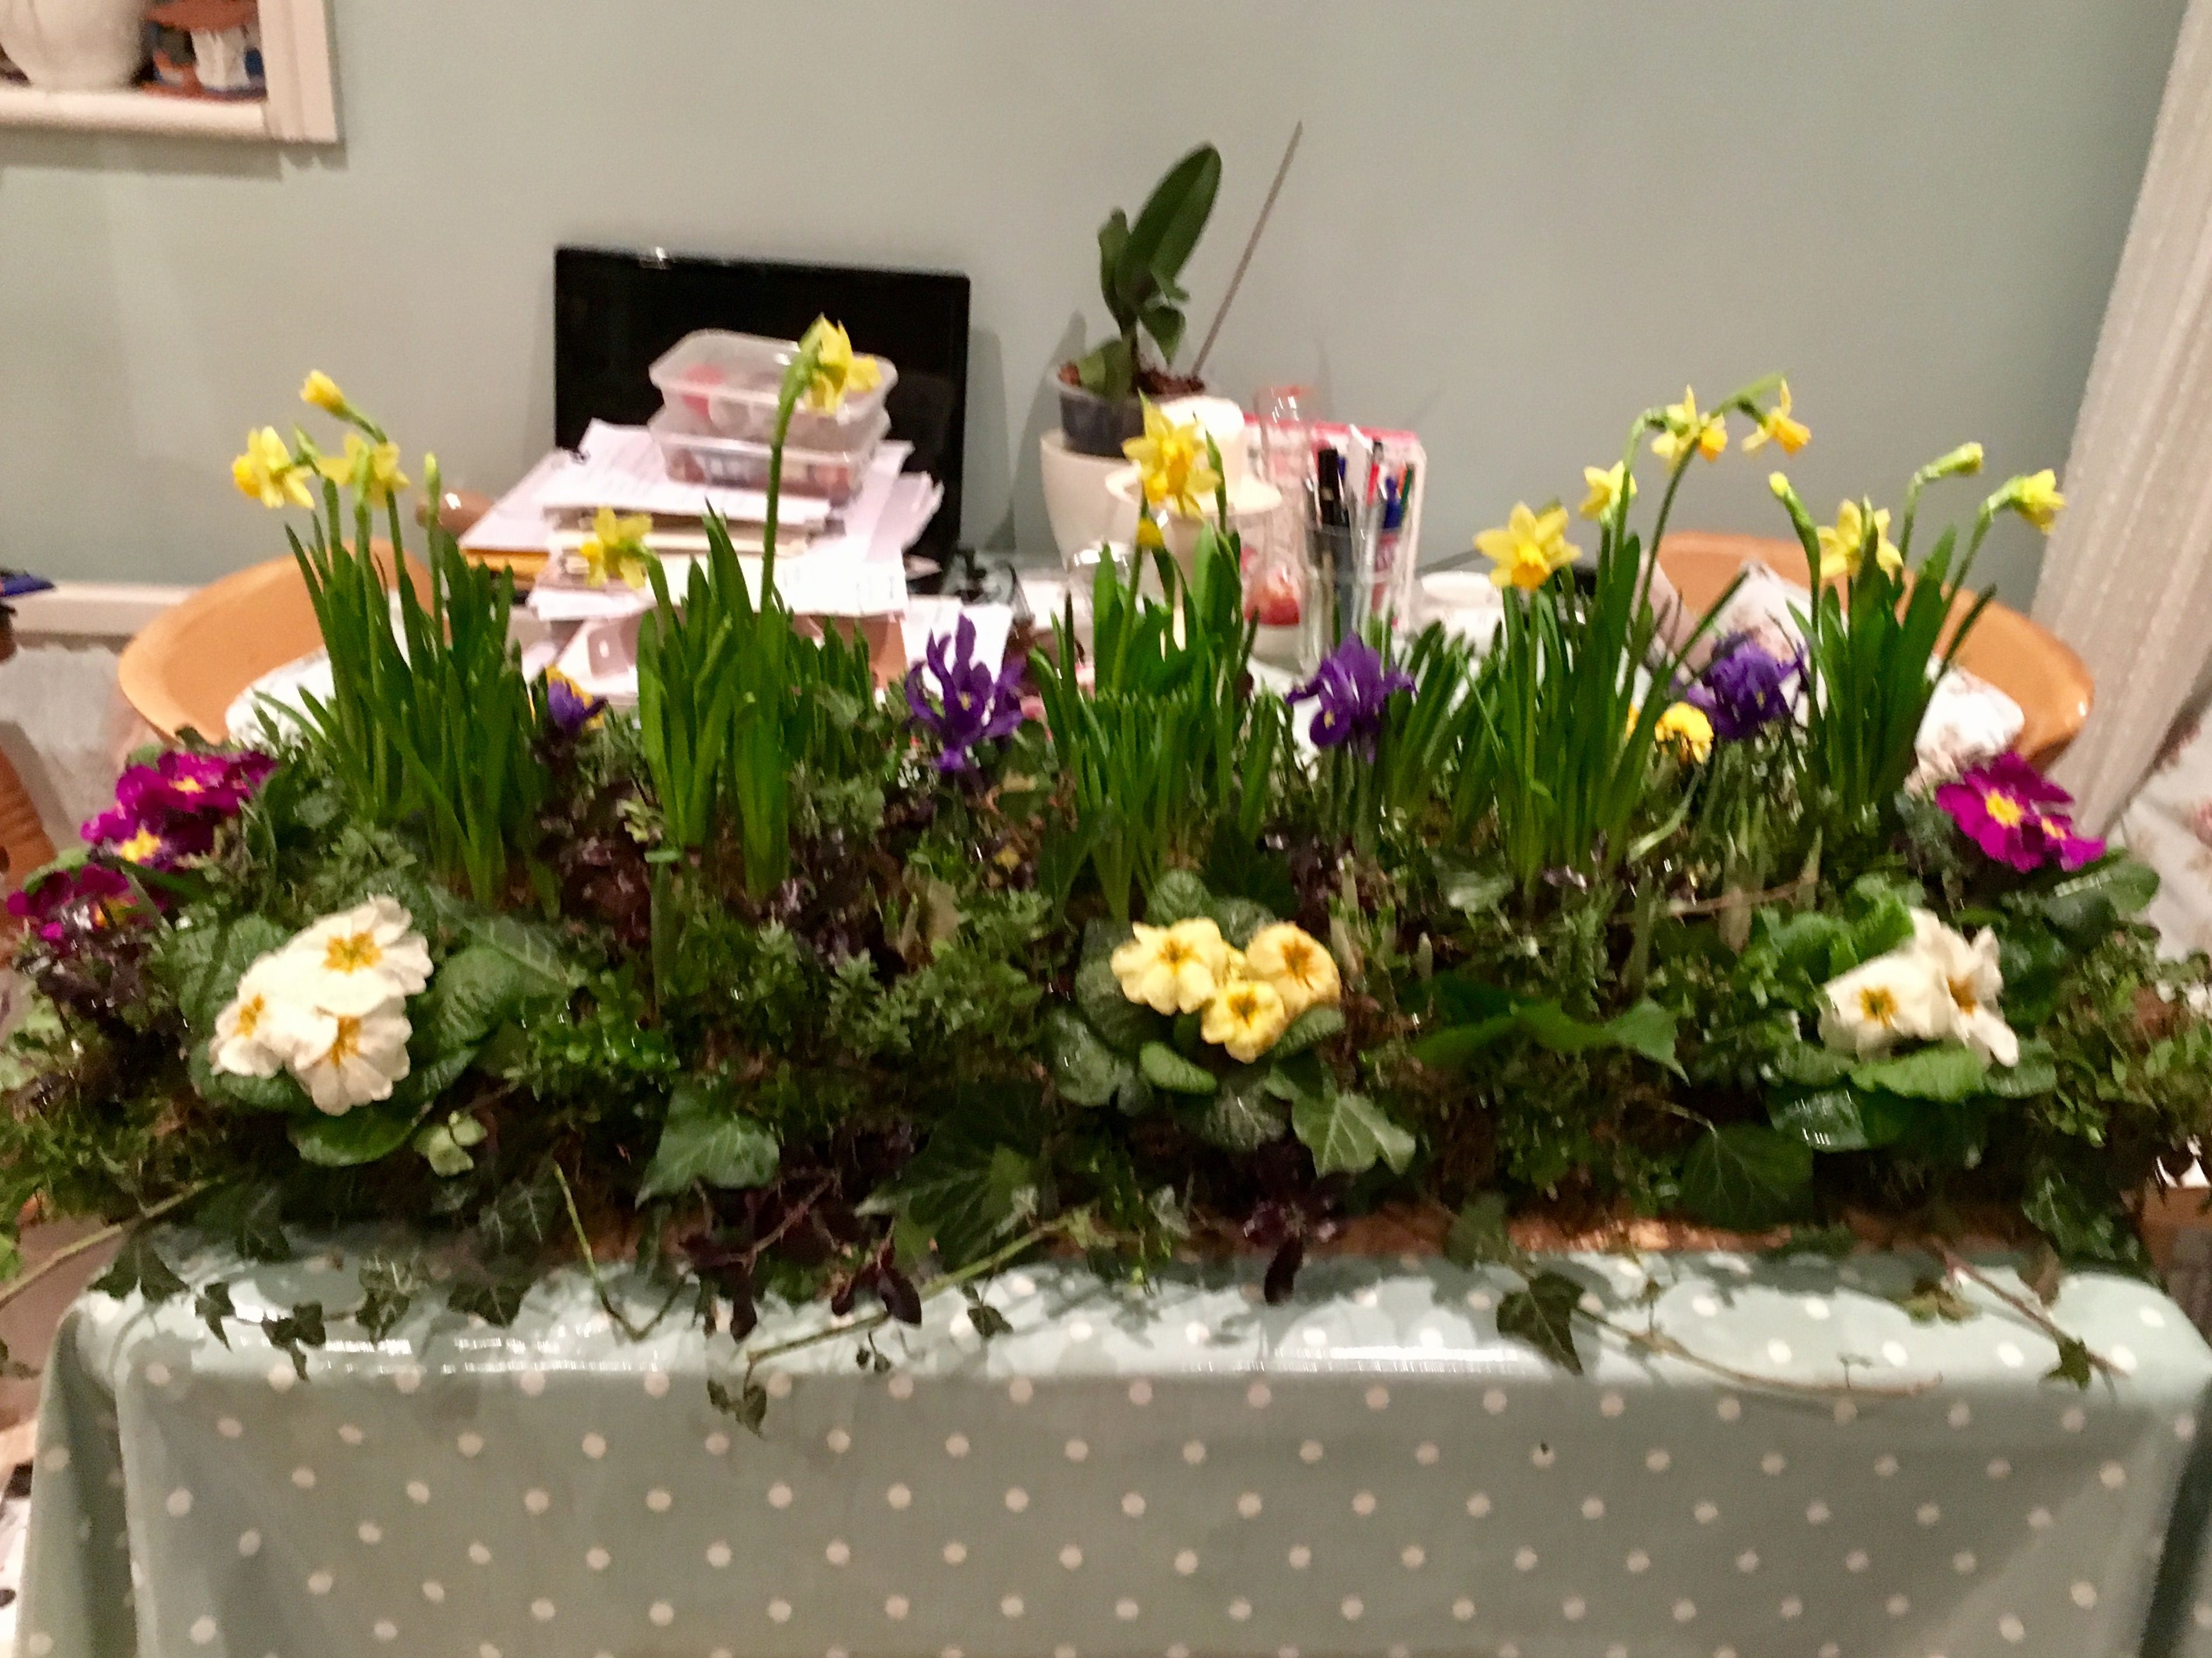 Spring flower garden funeral display by Isobel